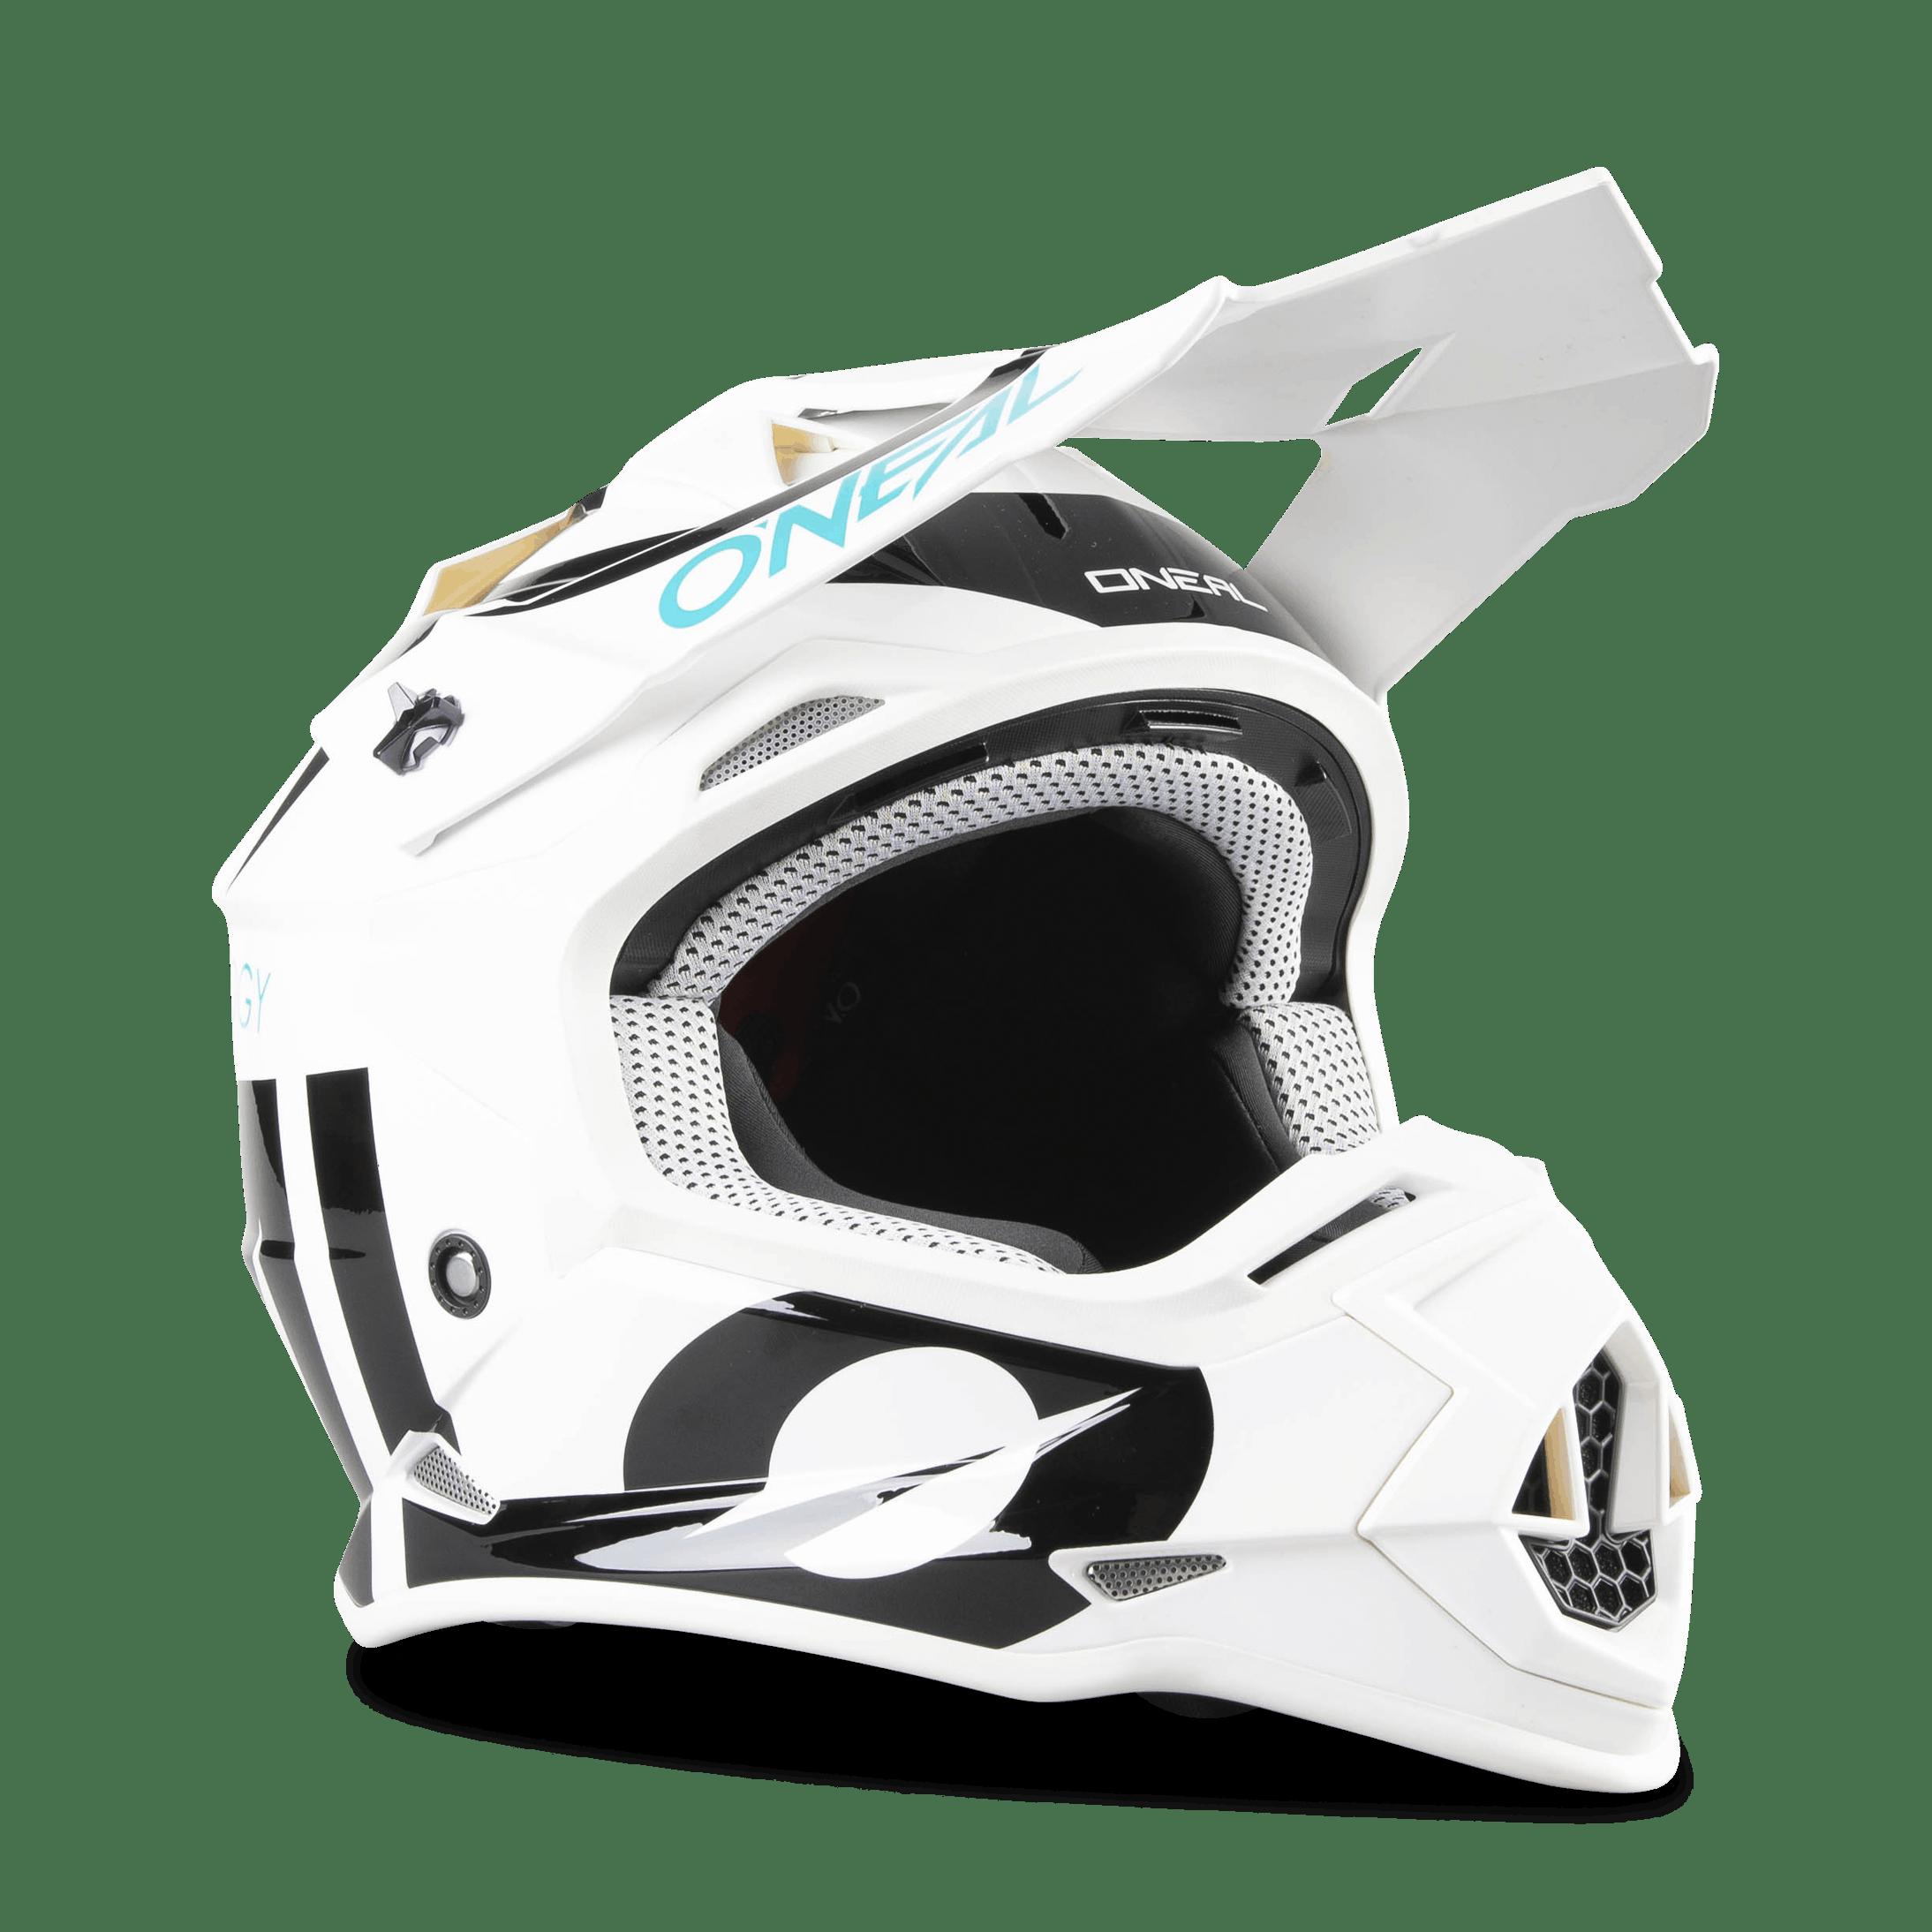 ONeal 2 Series RL Slick Motocross Helmet Yellow MX Enduro Off Road ...